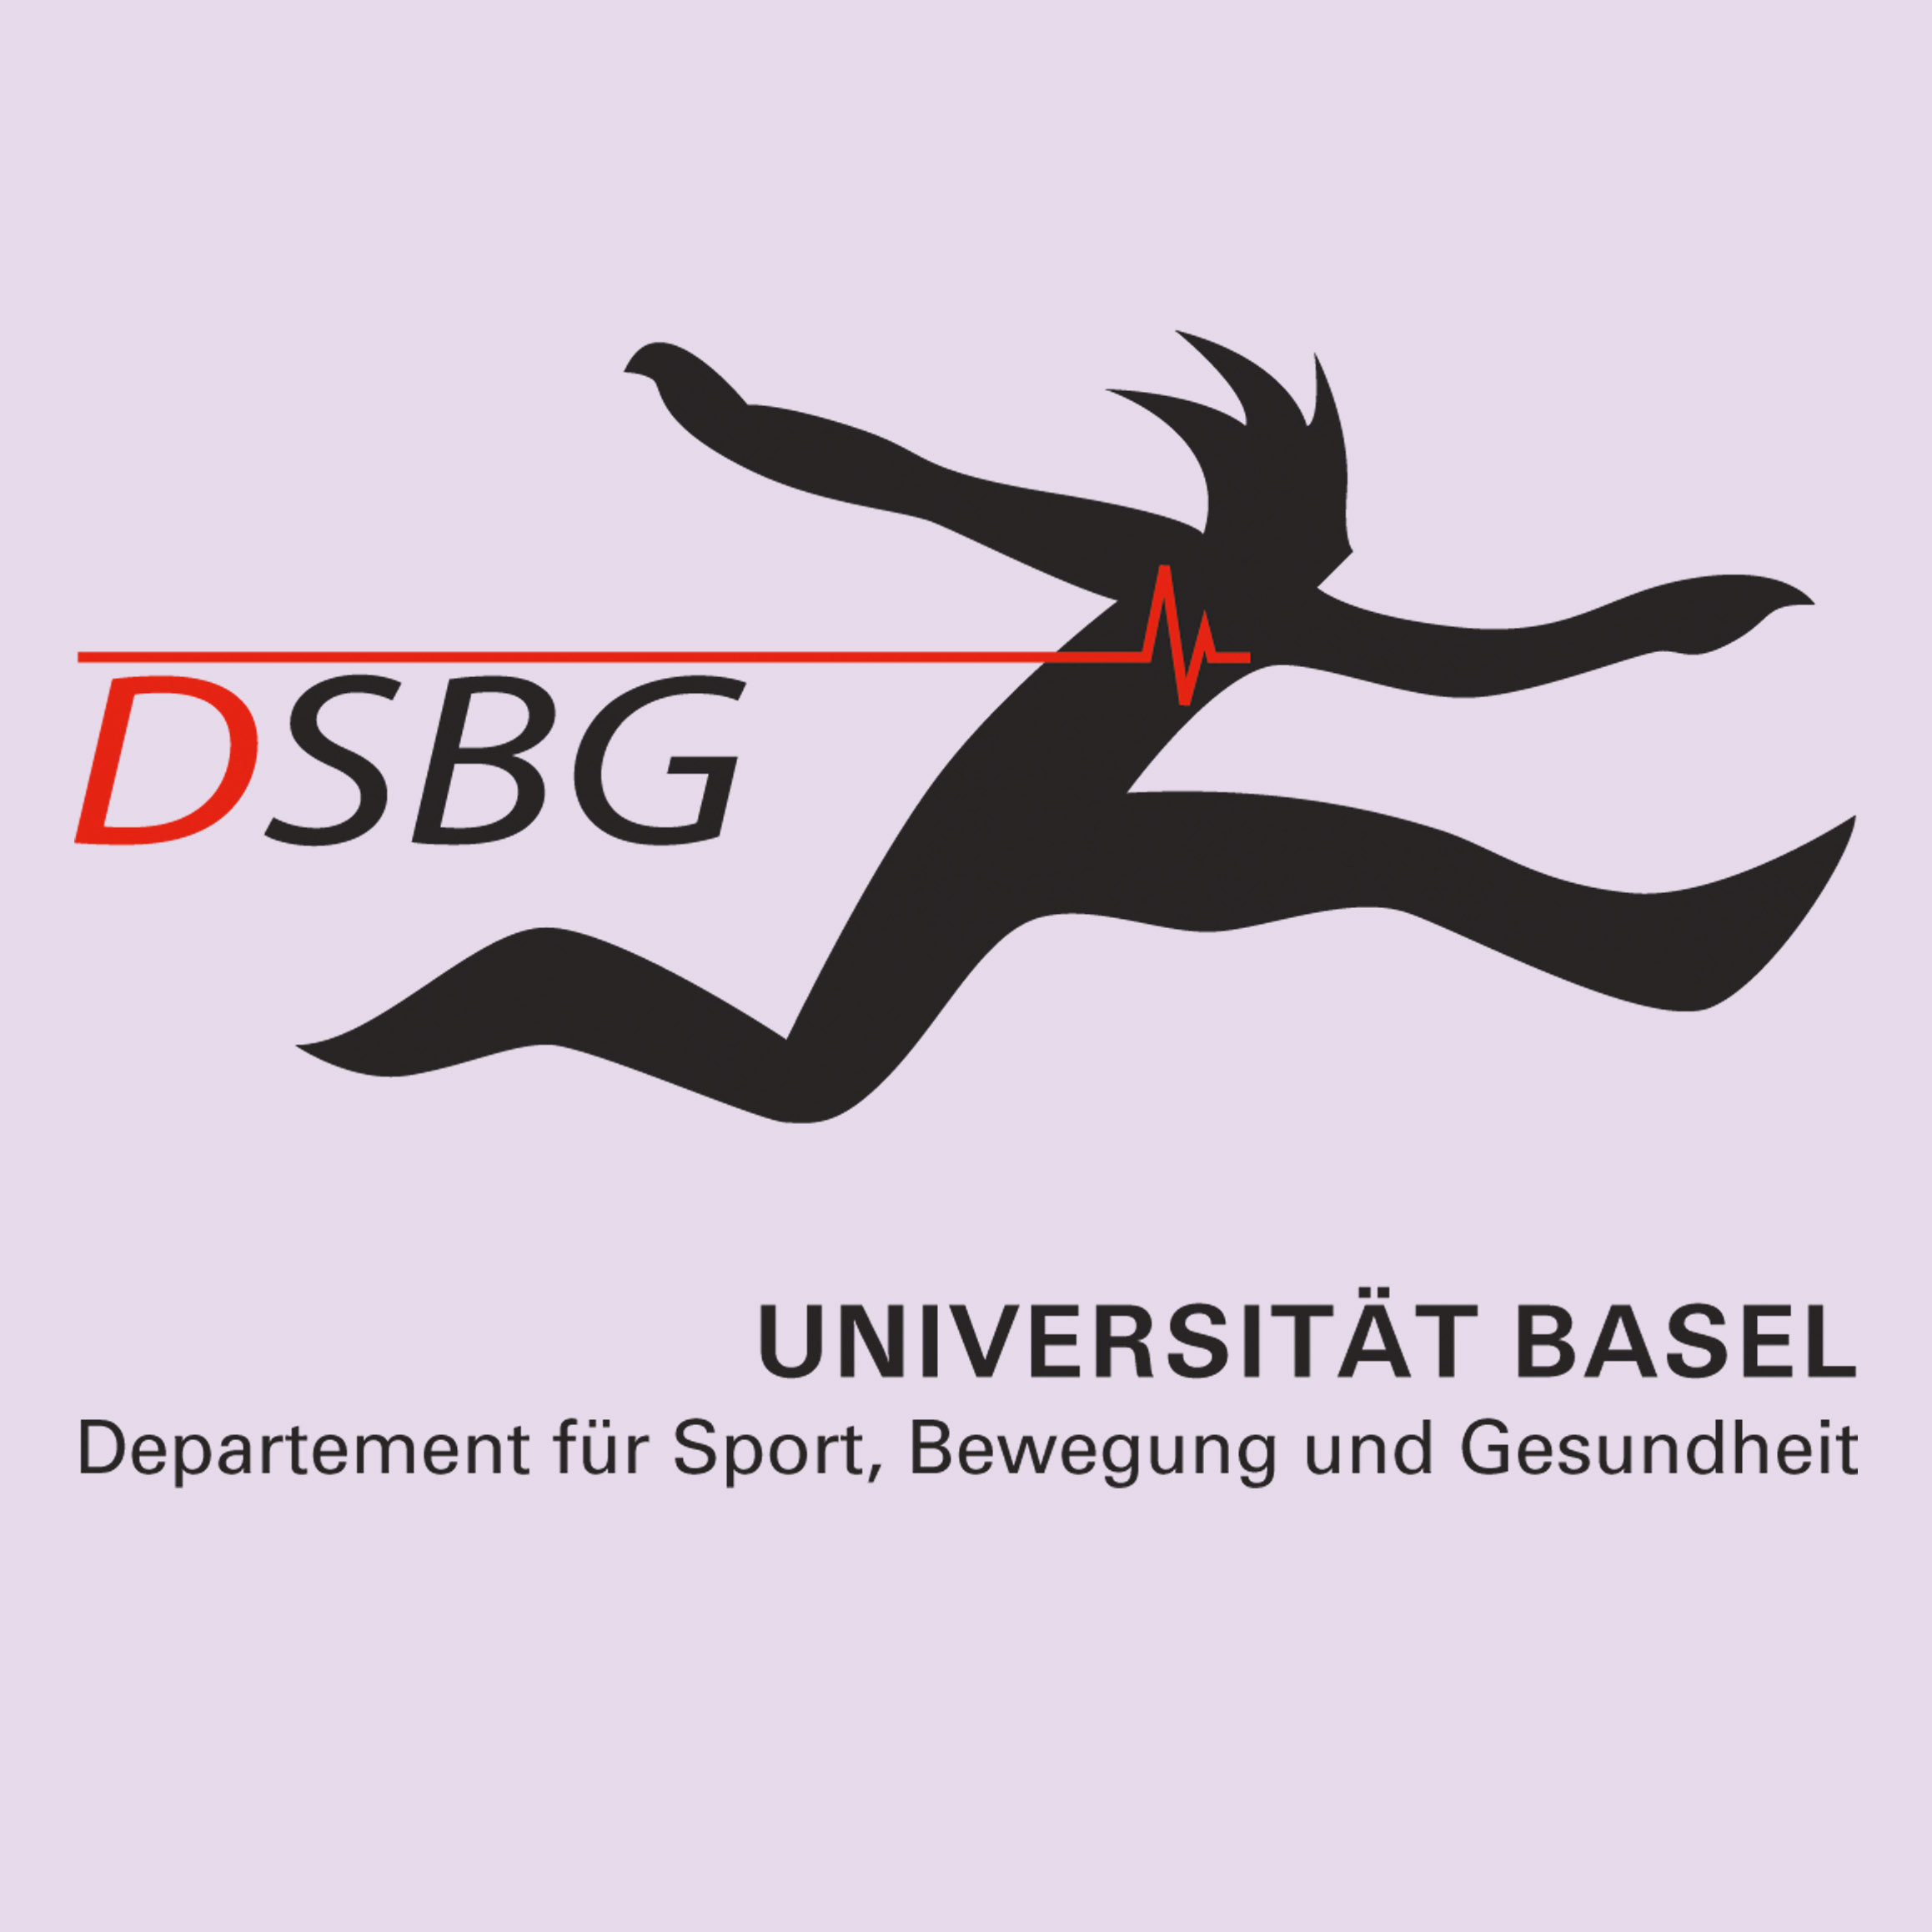 DSBG UNI BASEL